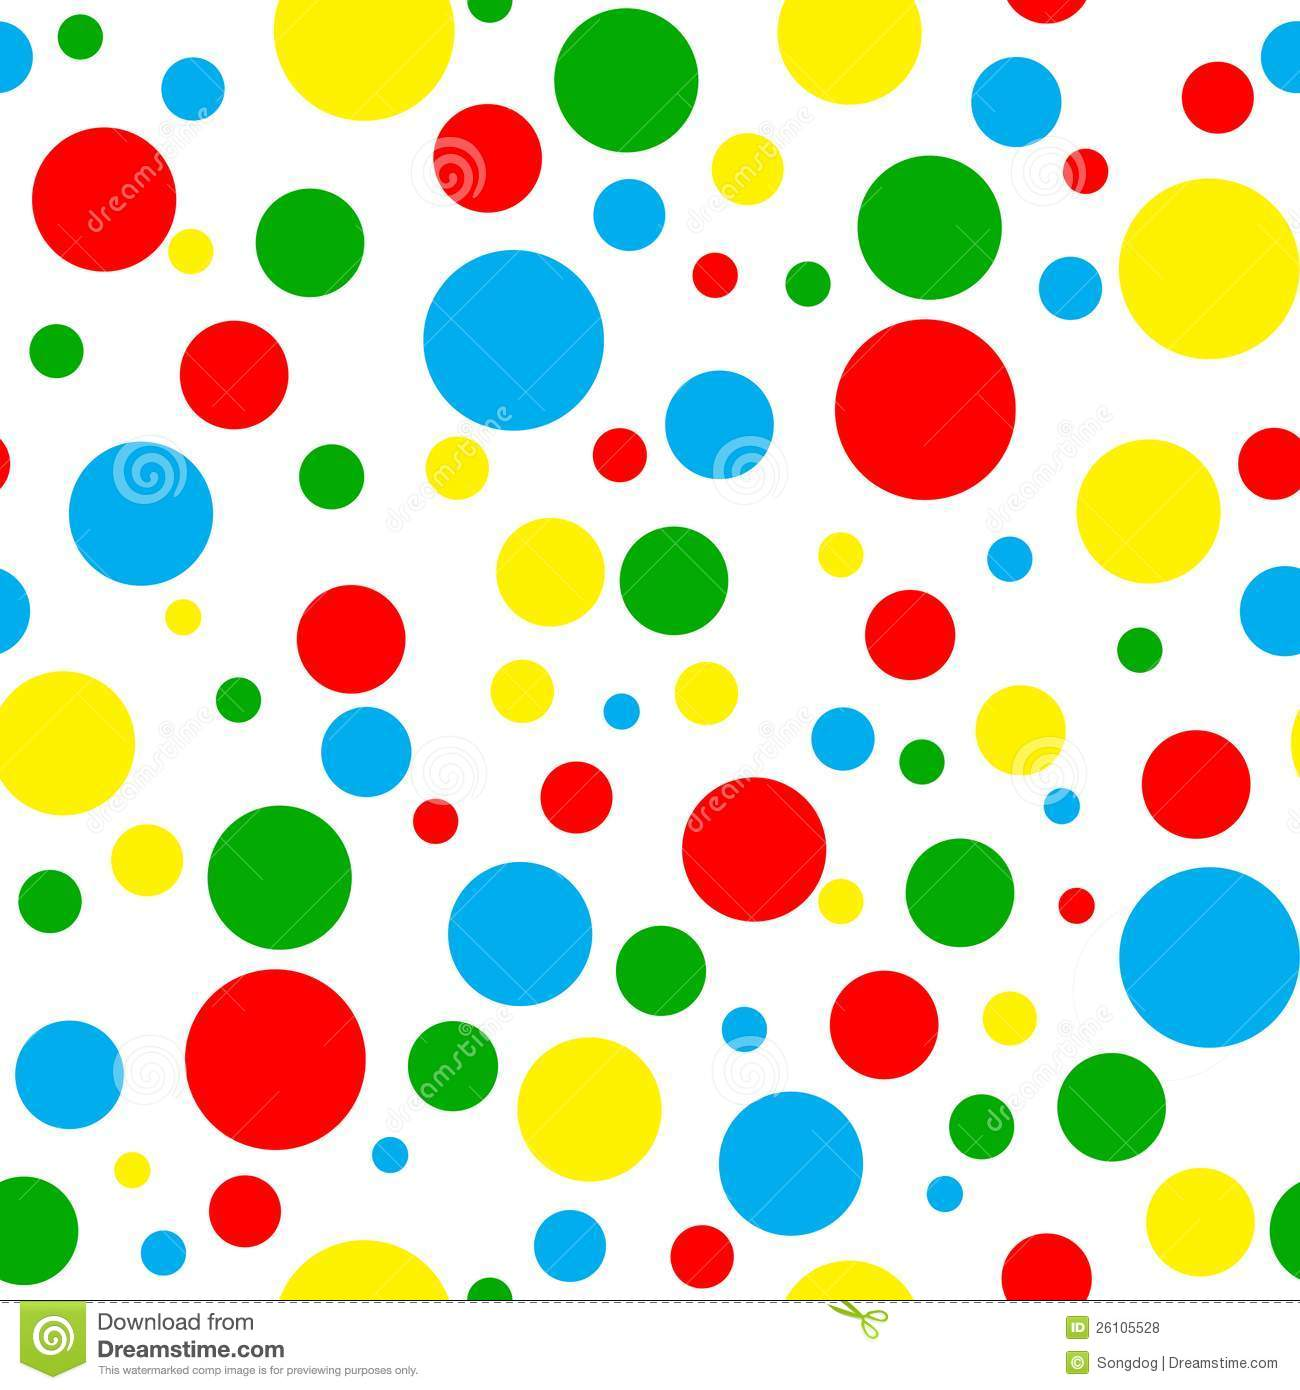 Polka dot clipart free - ClipartFest